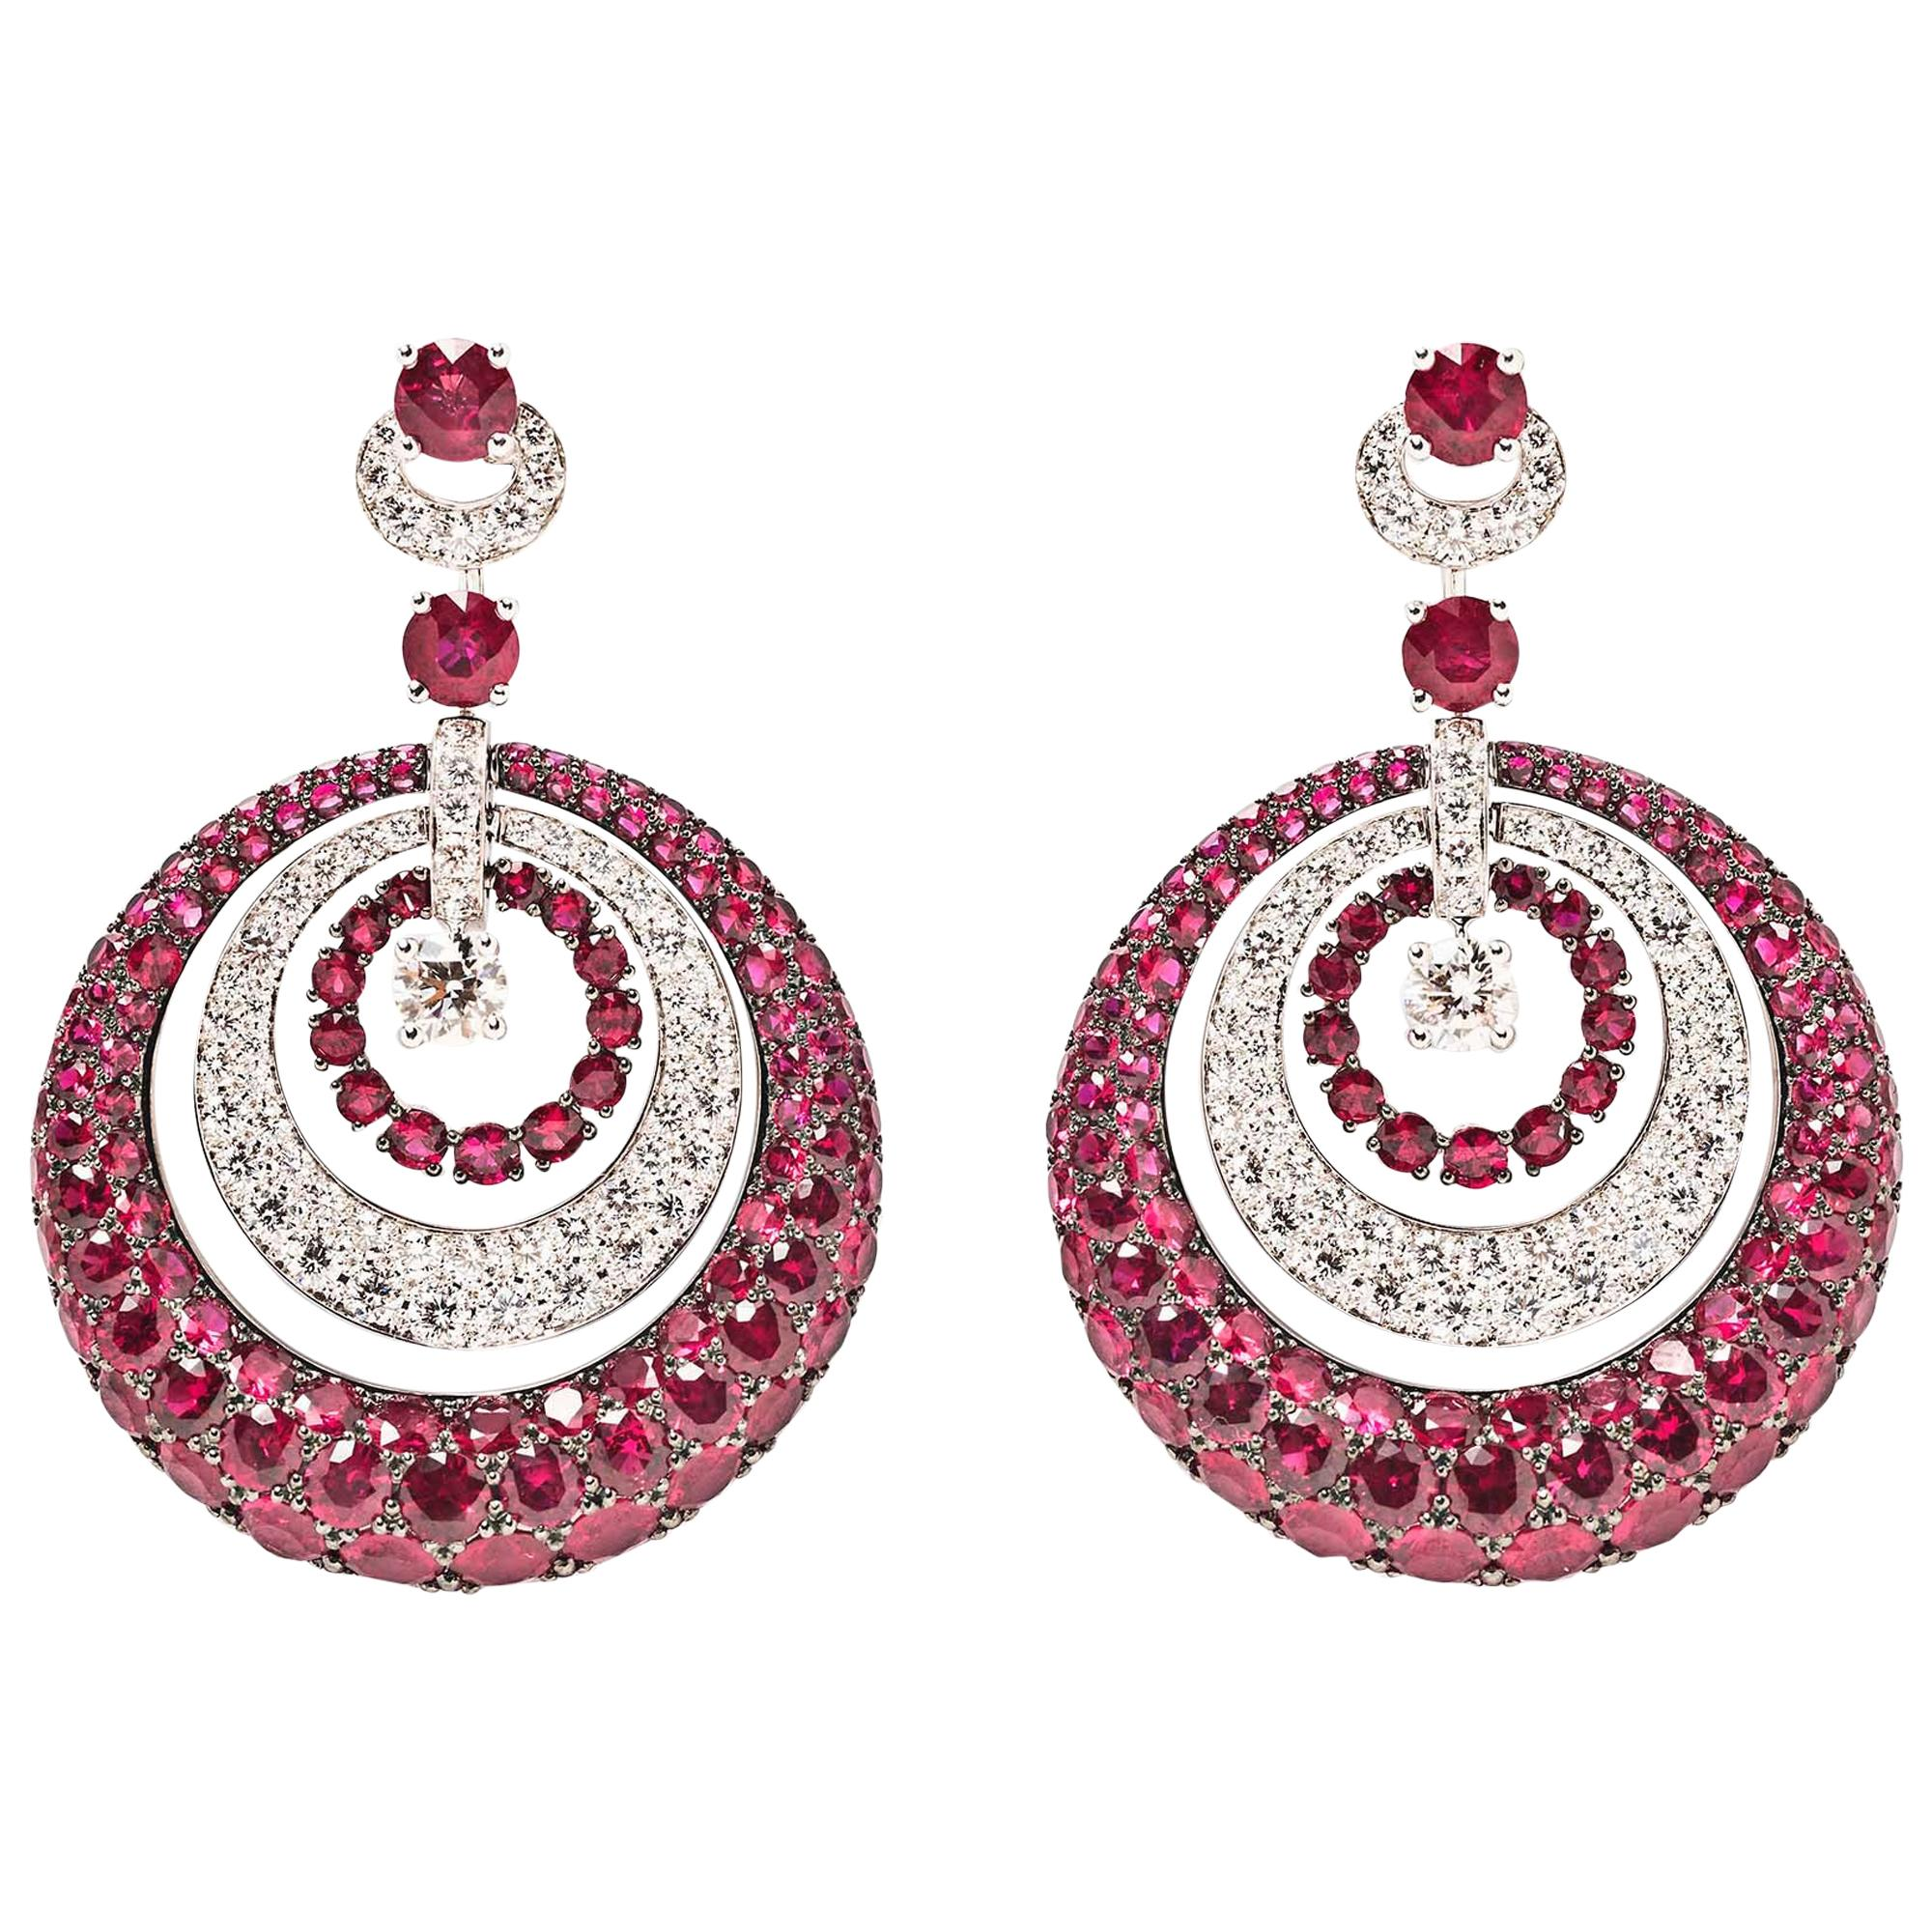 Graff Ruby and Diamond Pendant Earrings